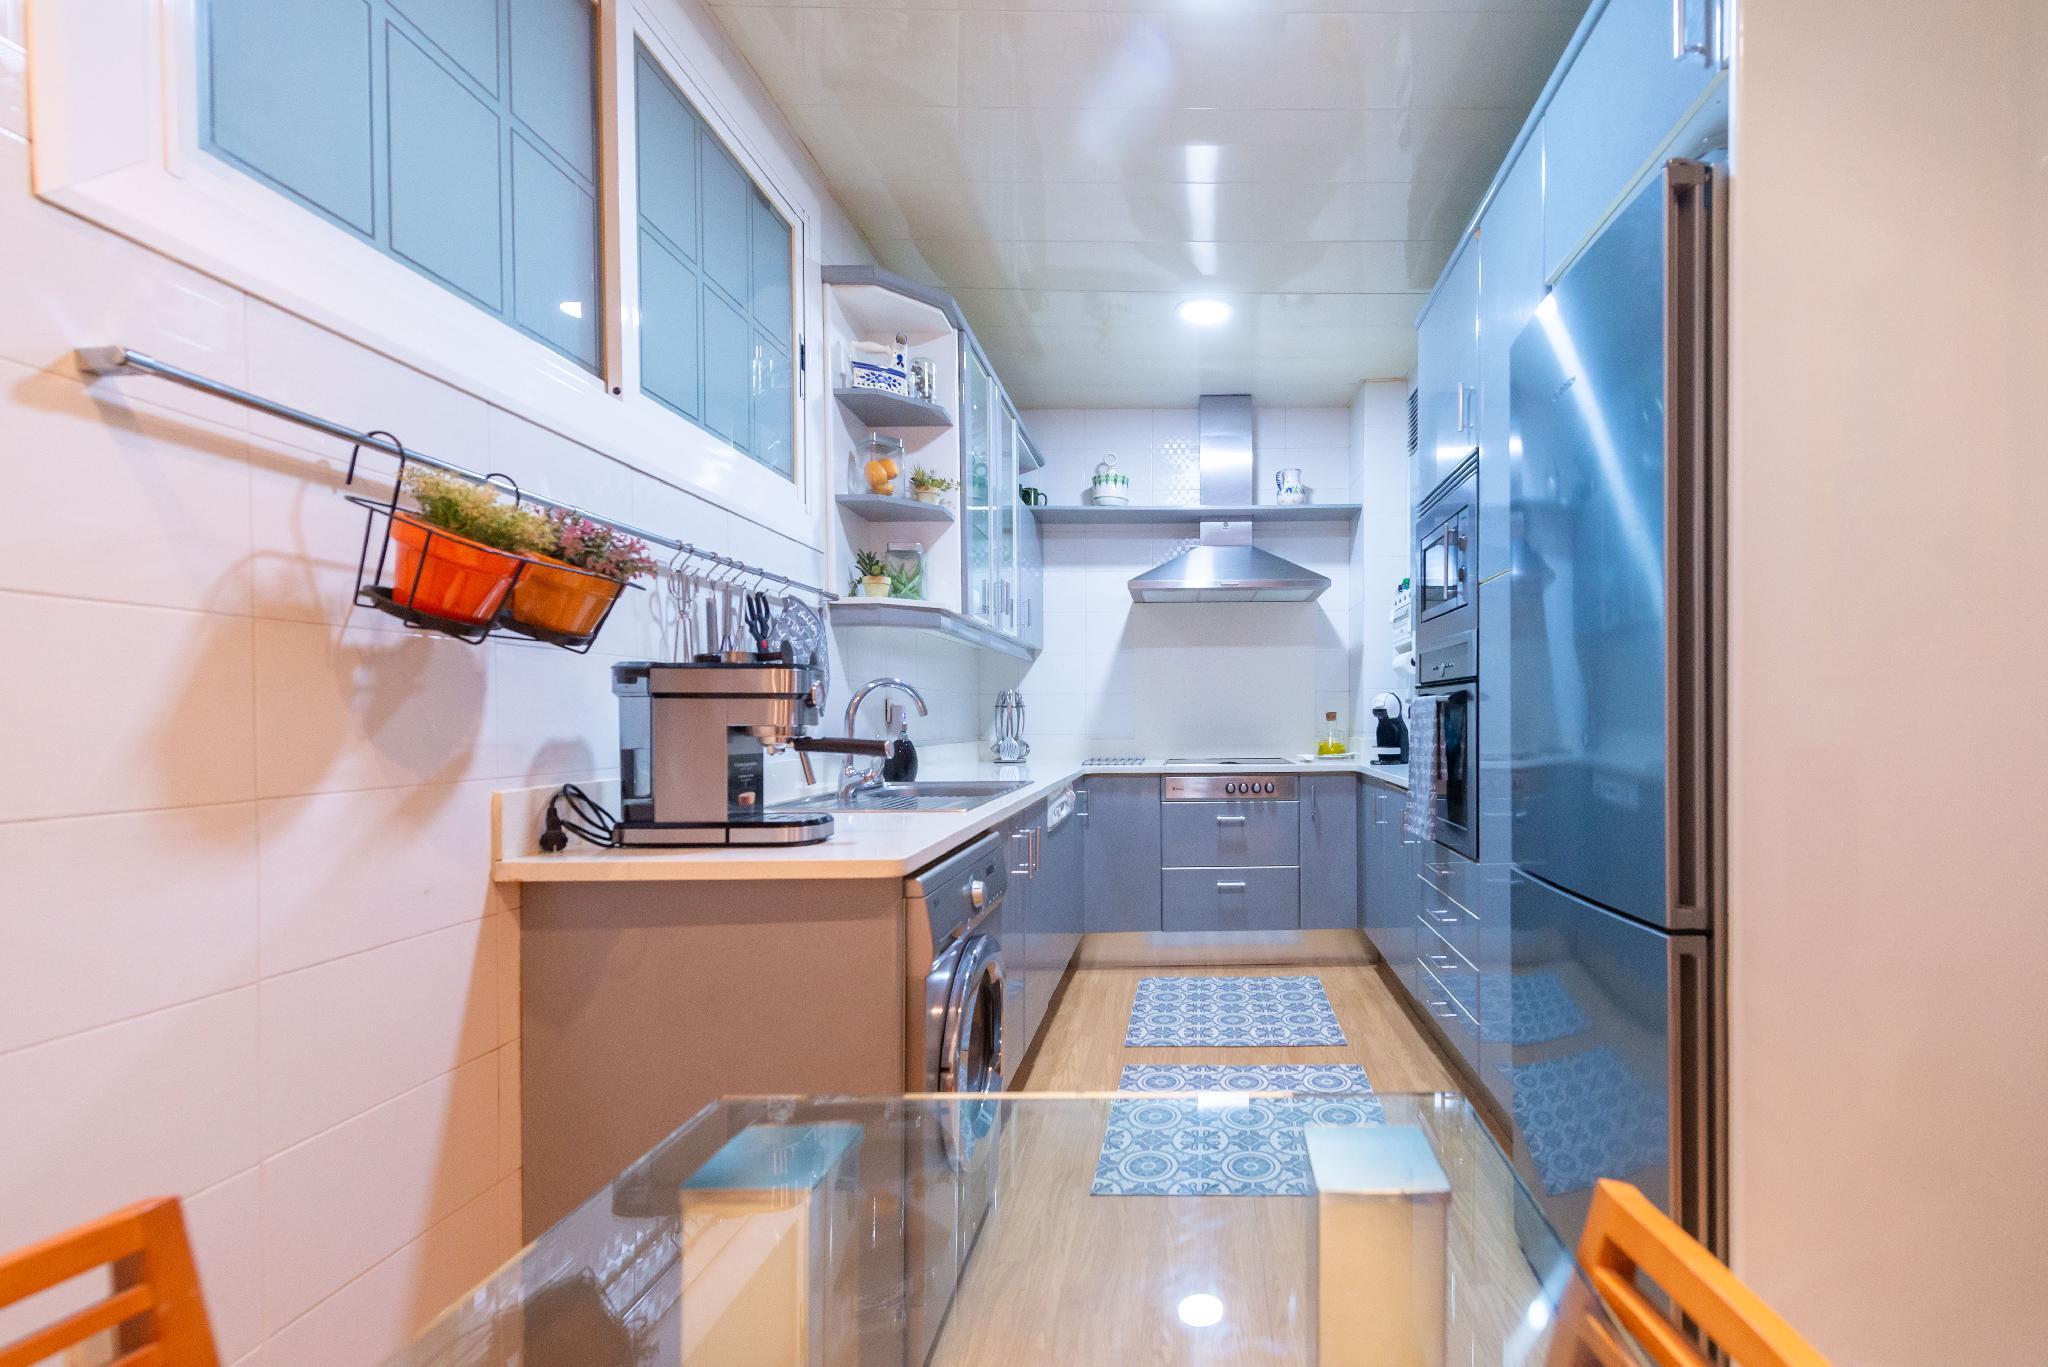 166582 Flat for sale in Eixample, Dreta Eixample 12